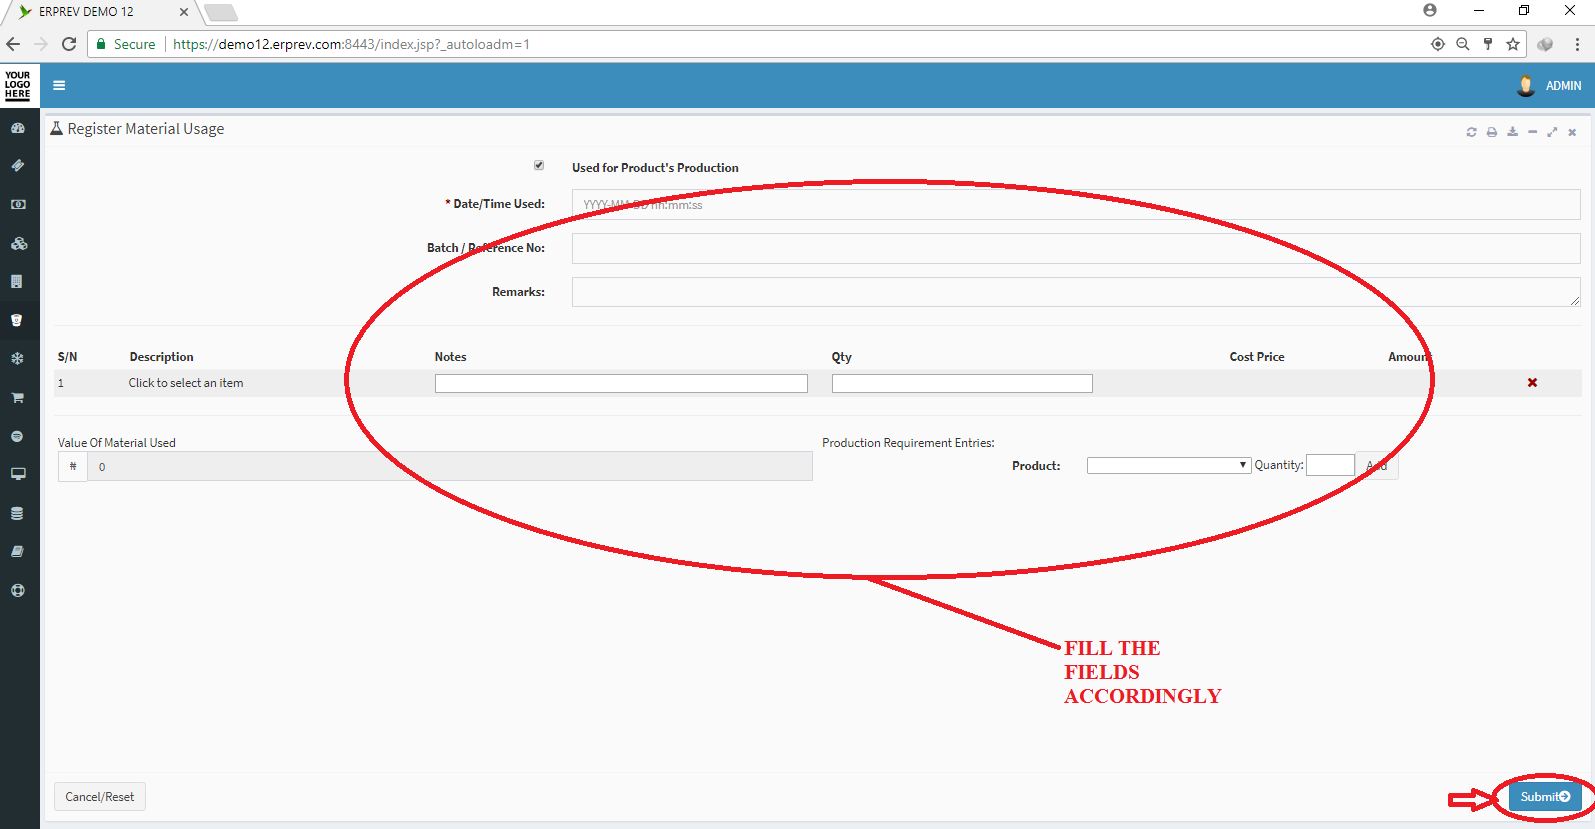 Register Material Usage